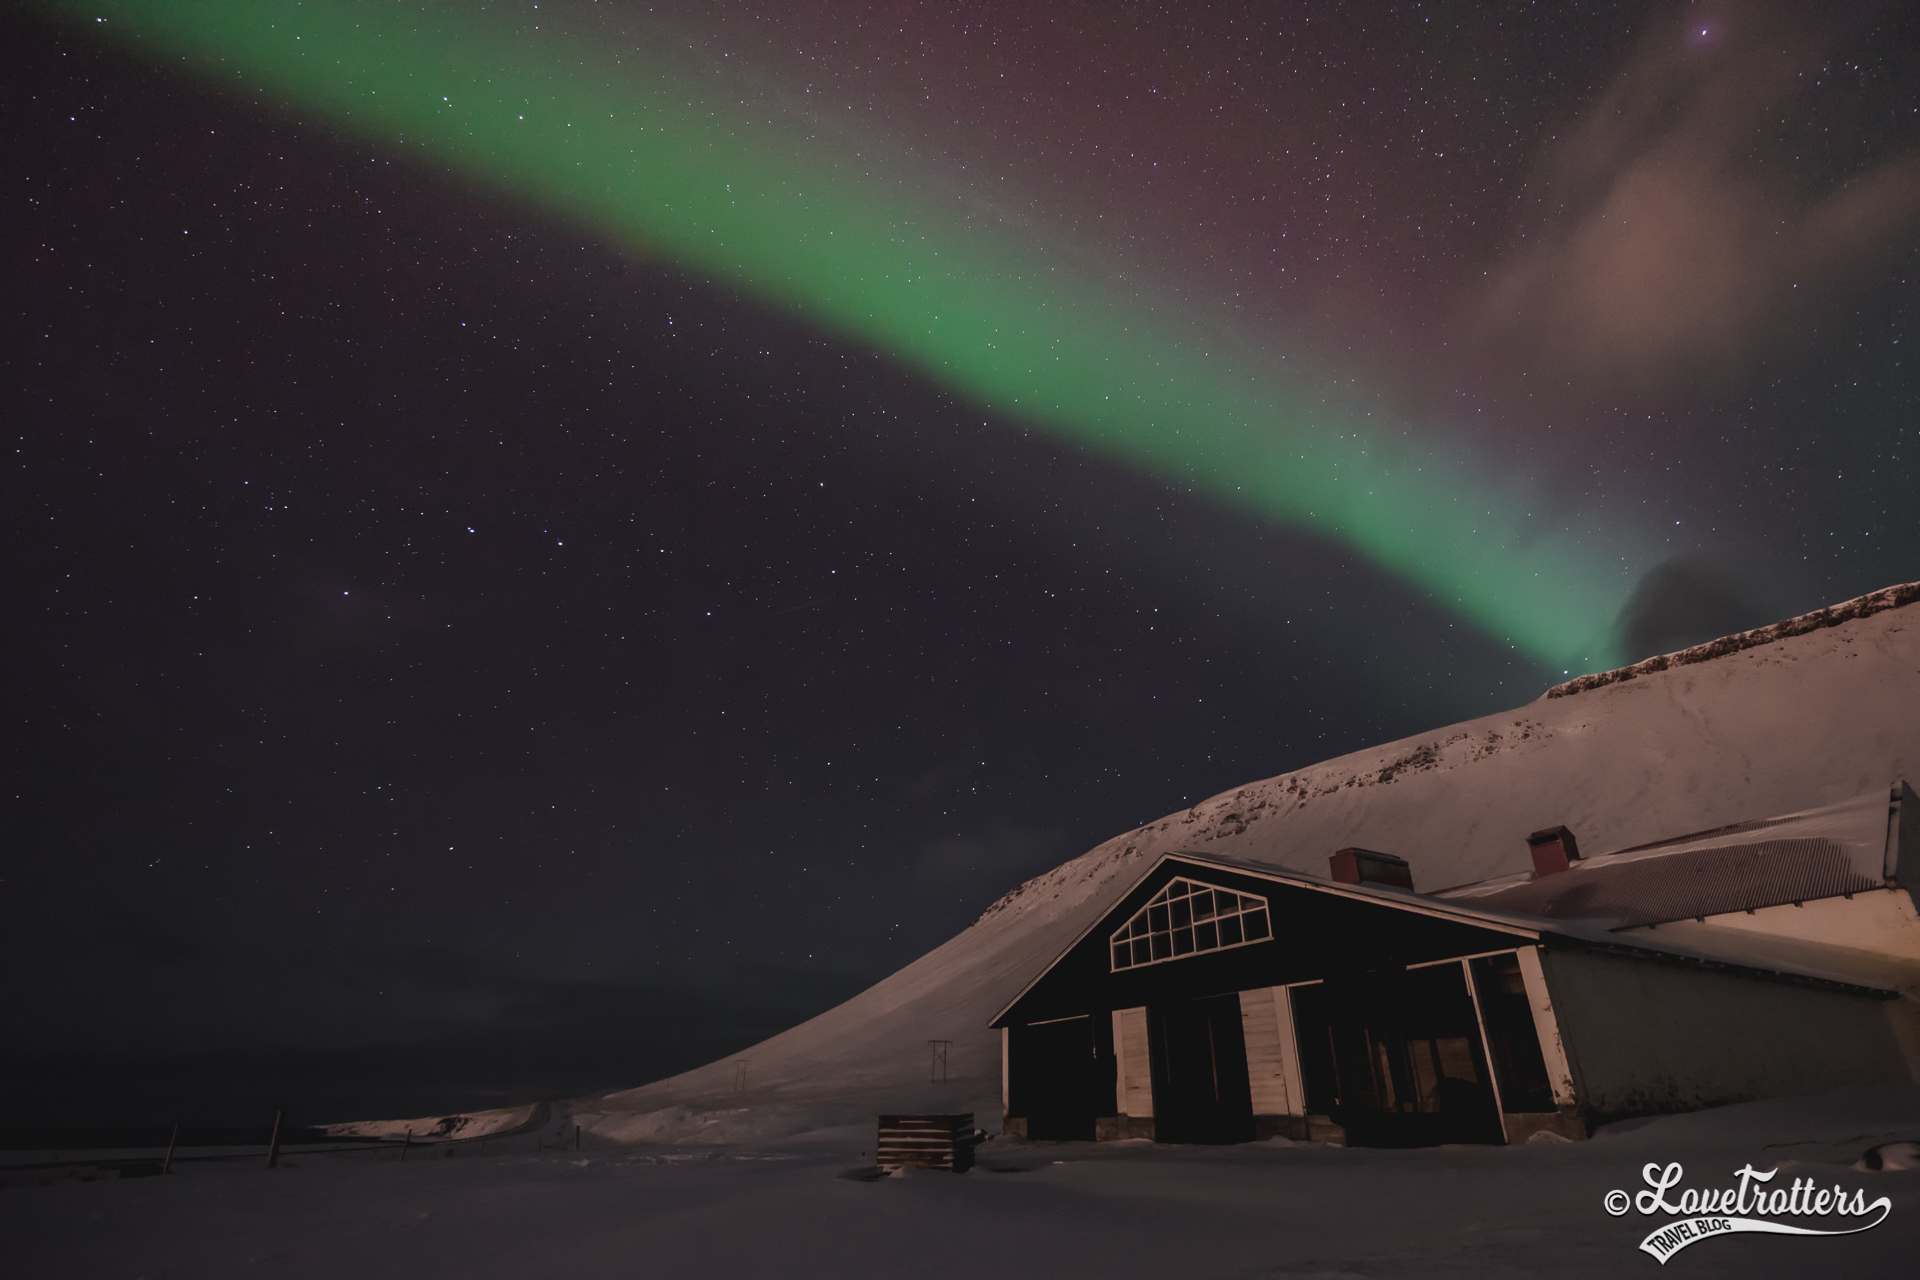 photographier des aurores boréales en Islande